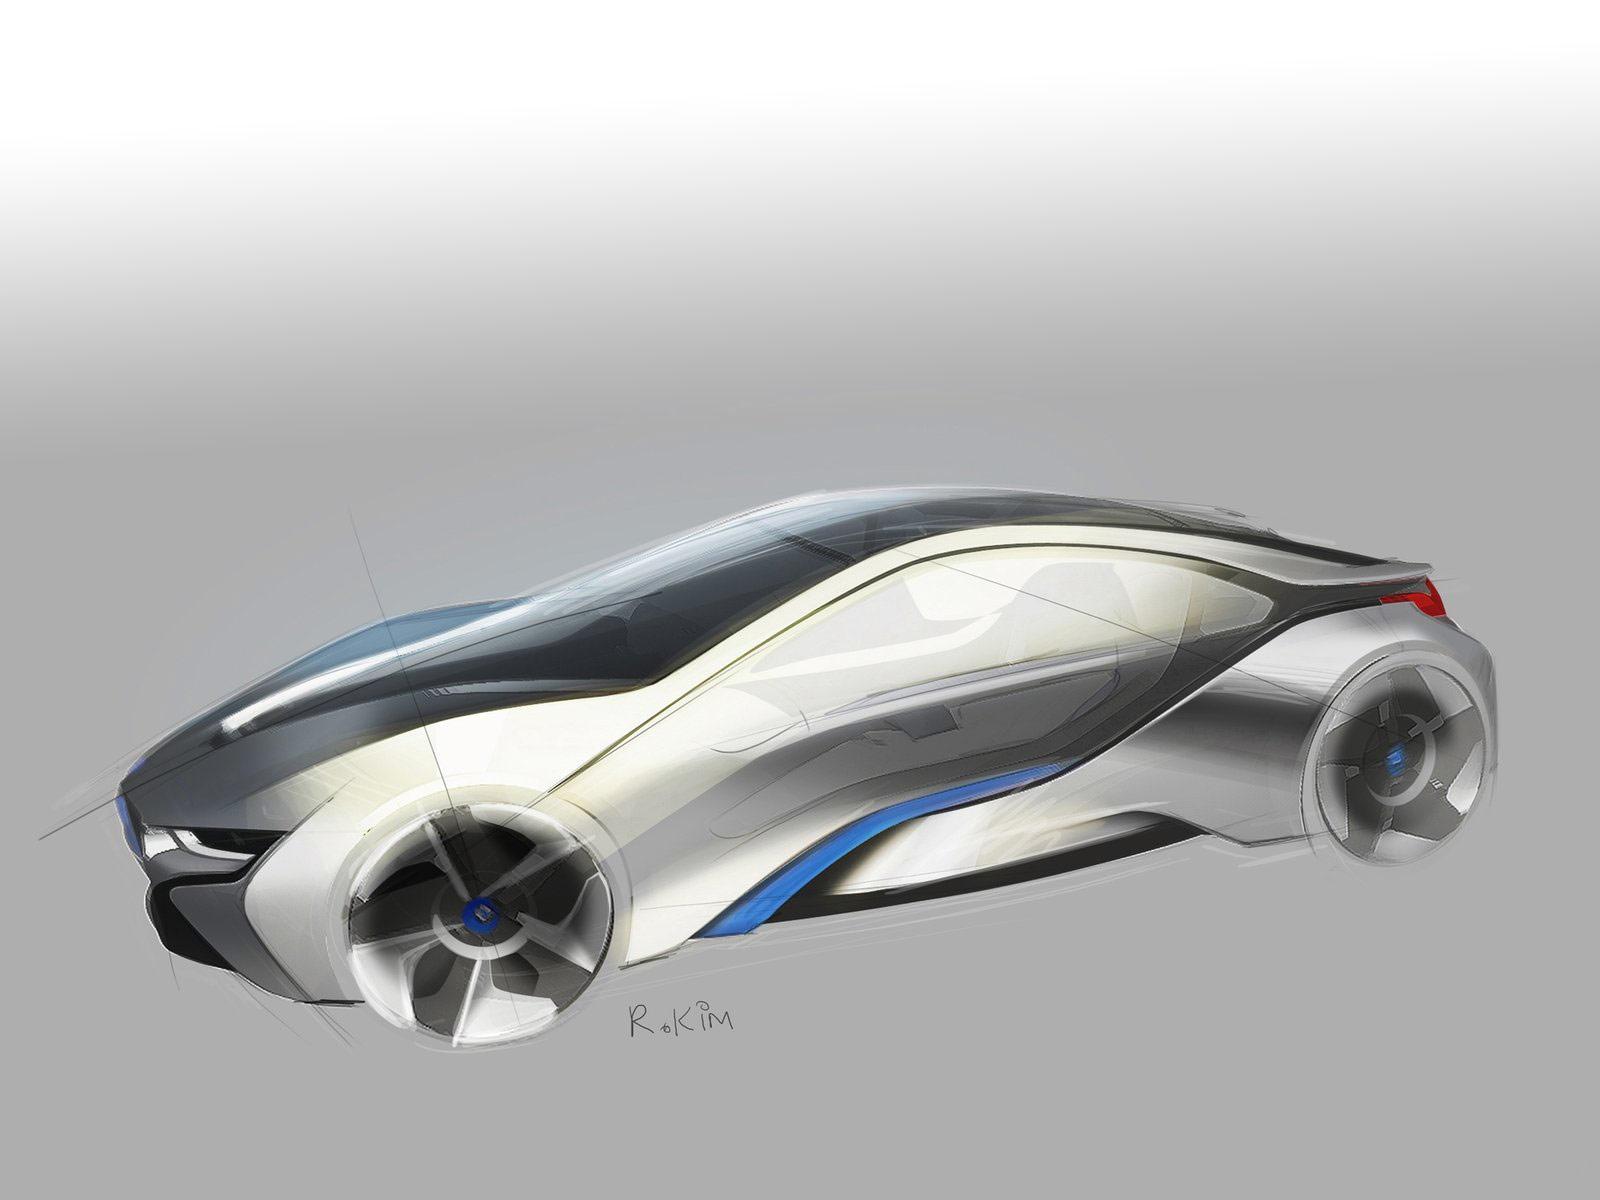 http://4.bp.blogspot.com/-EQYOB_NqMKs/TmwZtemfrKI/AAAAAAAADiE/KH7CvbVWccM/s1600/BMW-i8_Concept_2011_BMW-desktop-wallpapers_11.jpg